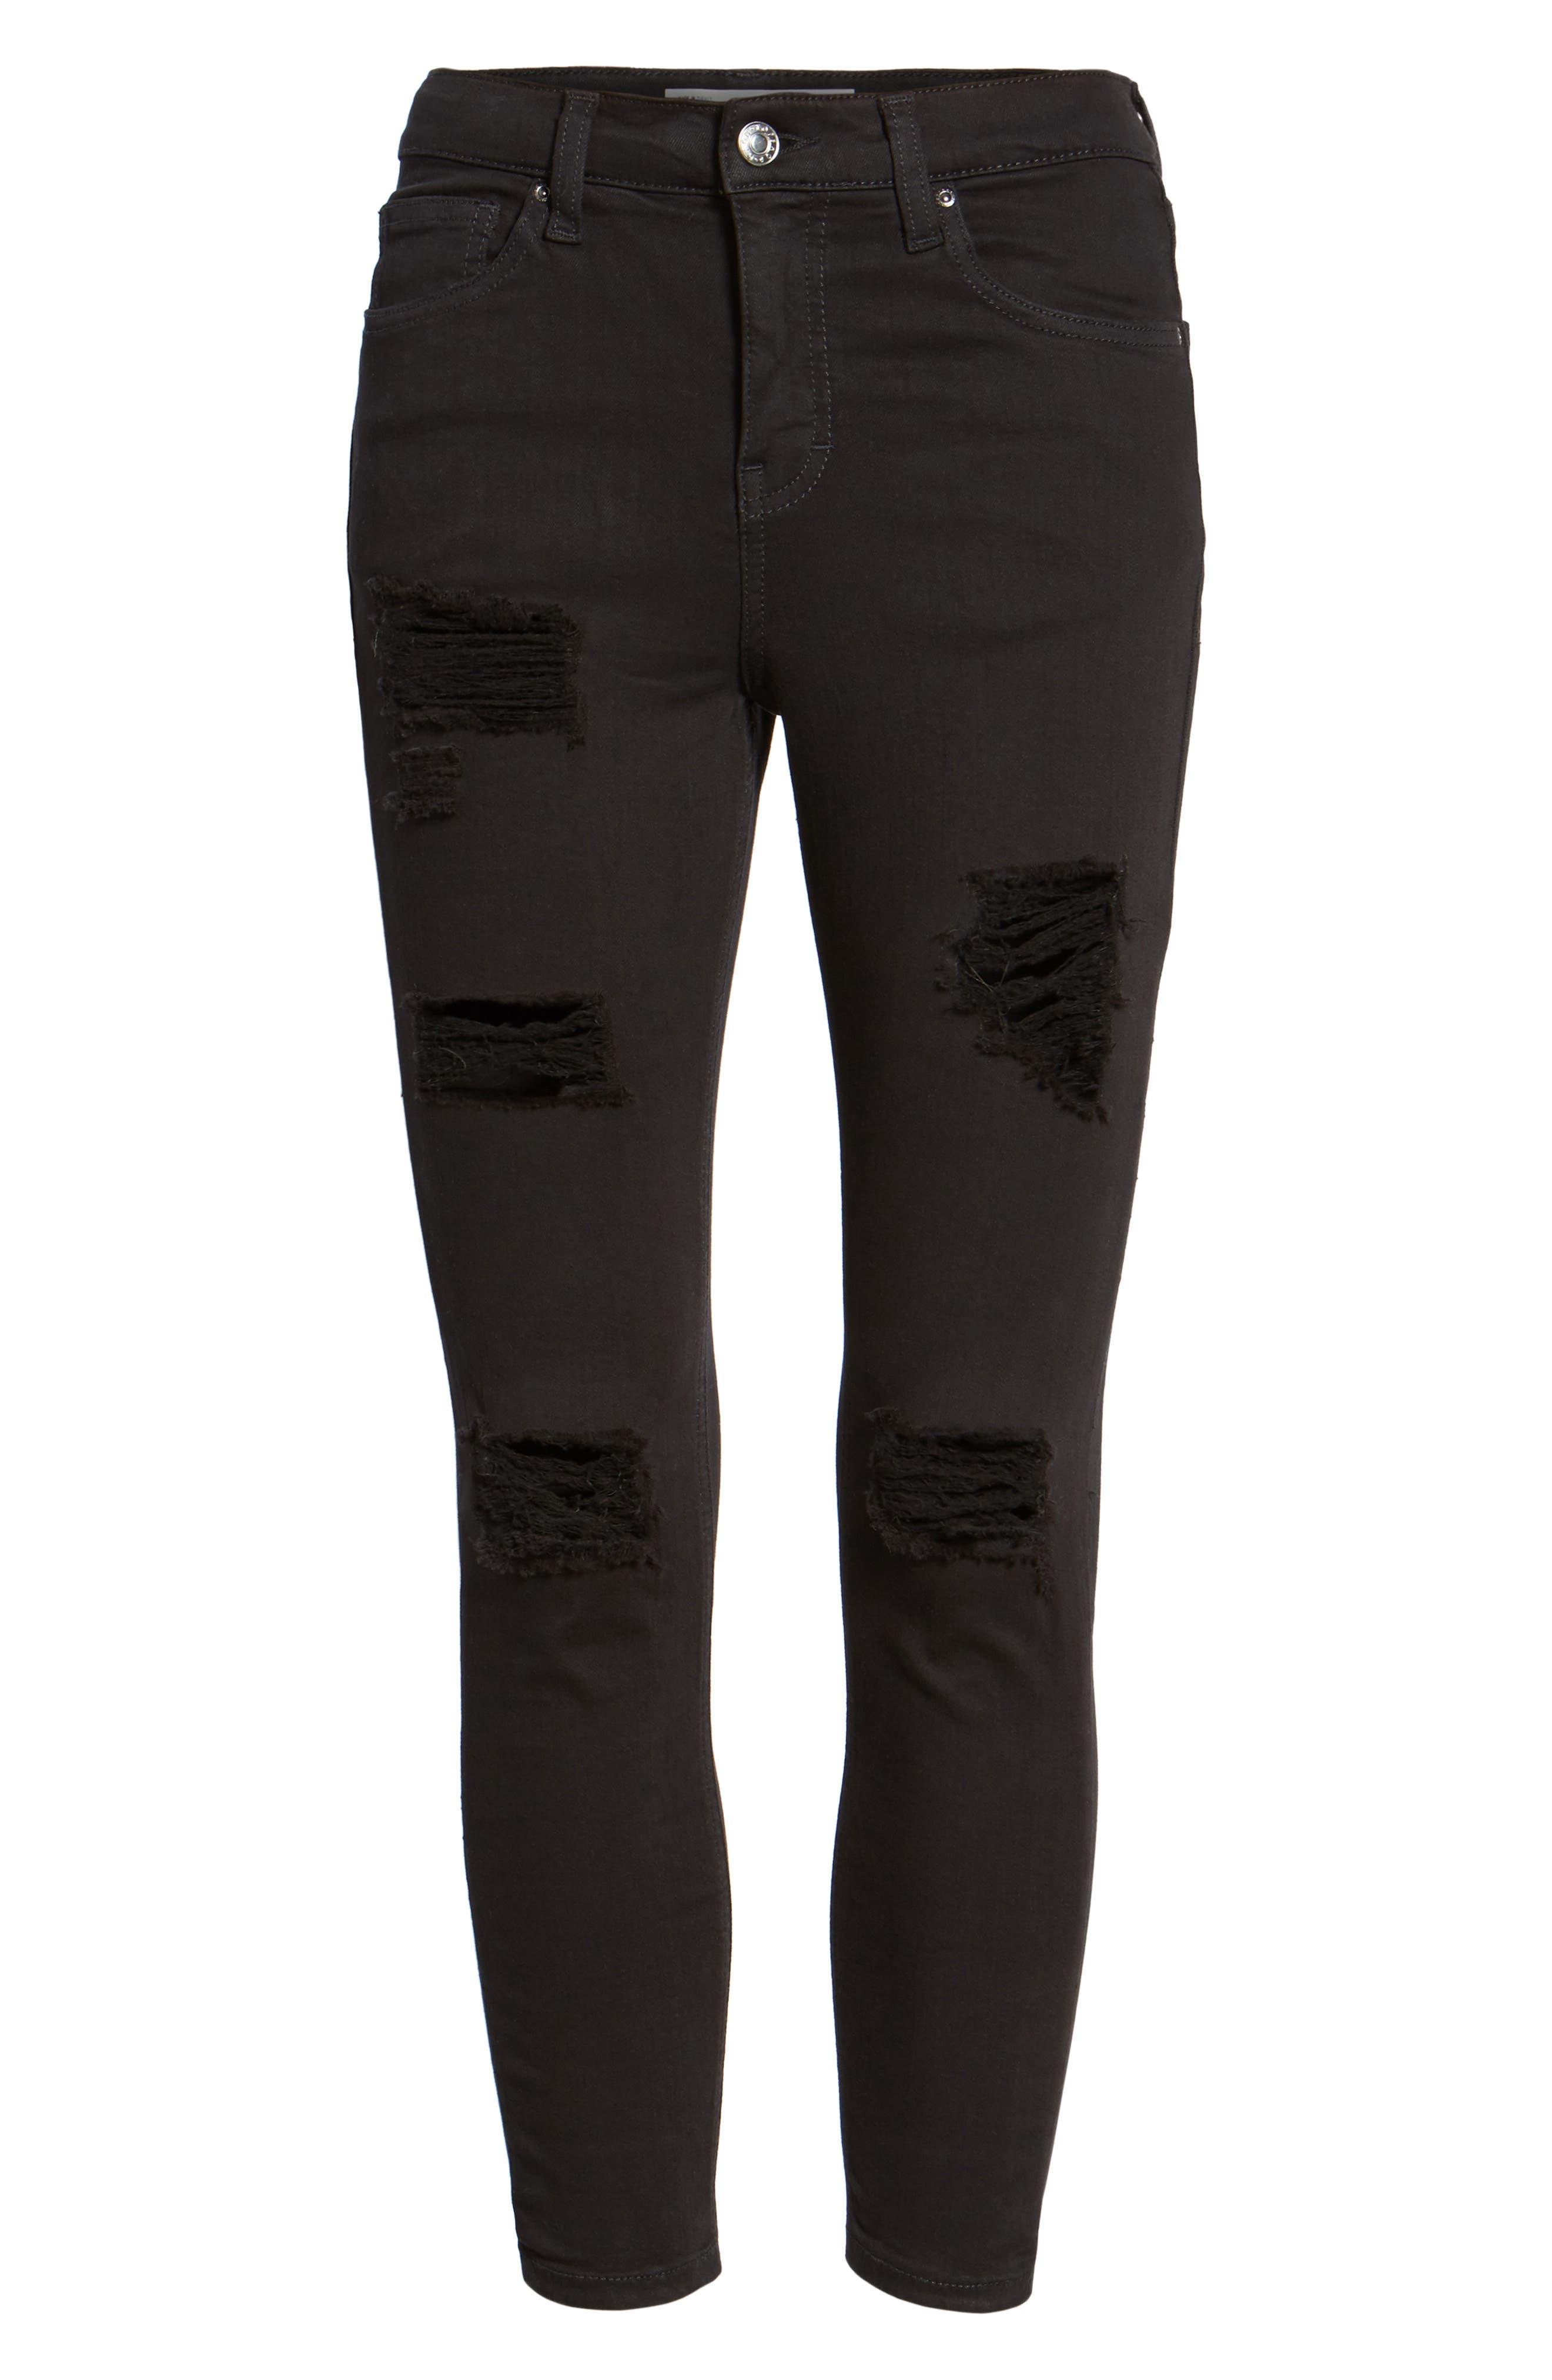 TOPSHOP, Moto 'Jamie' Ripped Skinny Jeans, Alternate thumbnail 7, color, 001